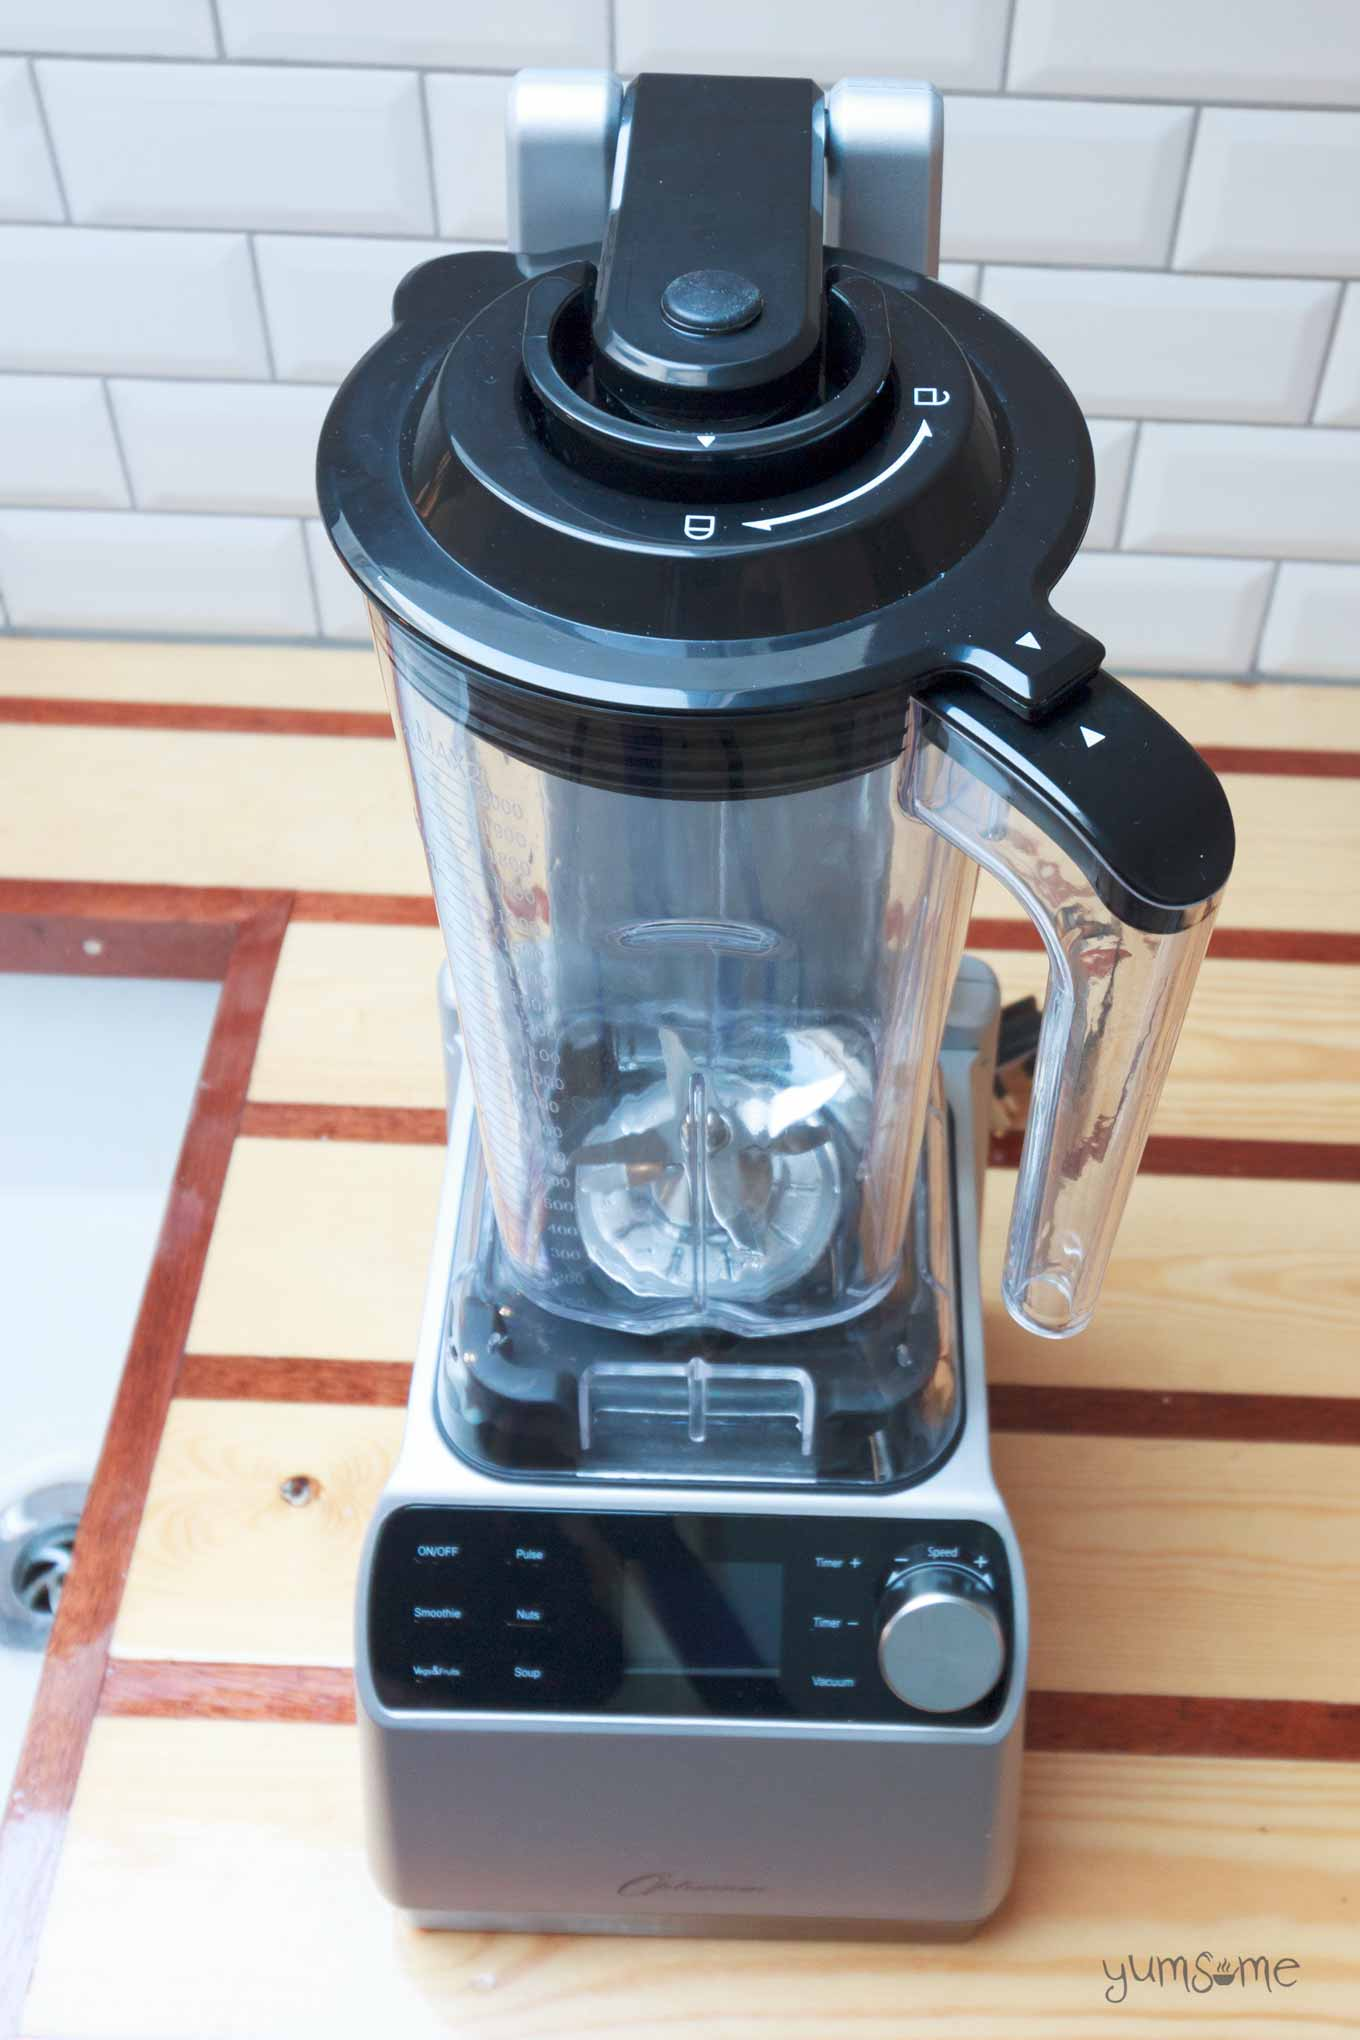 vaccuum seal on froothie optimum vac2 air vacuum blender | yumsome.com